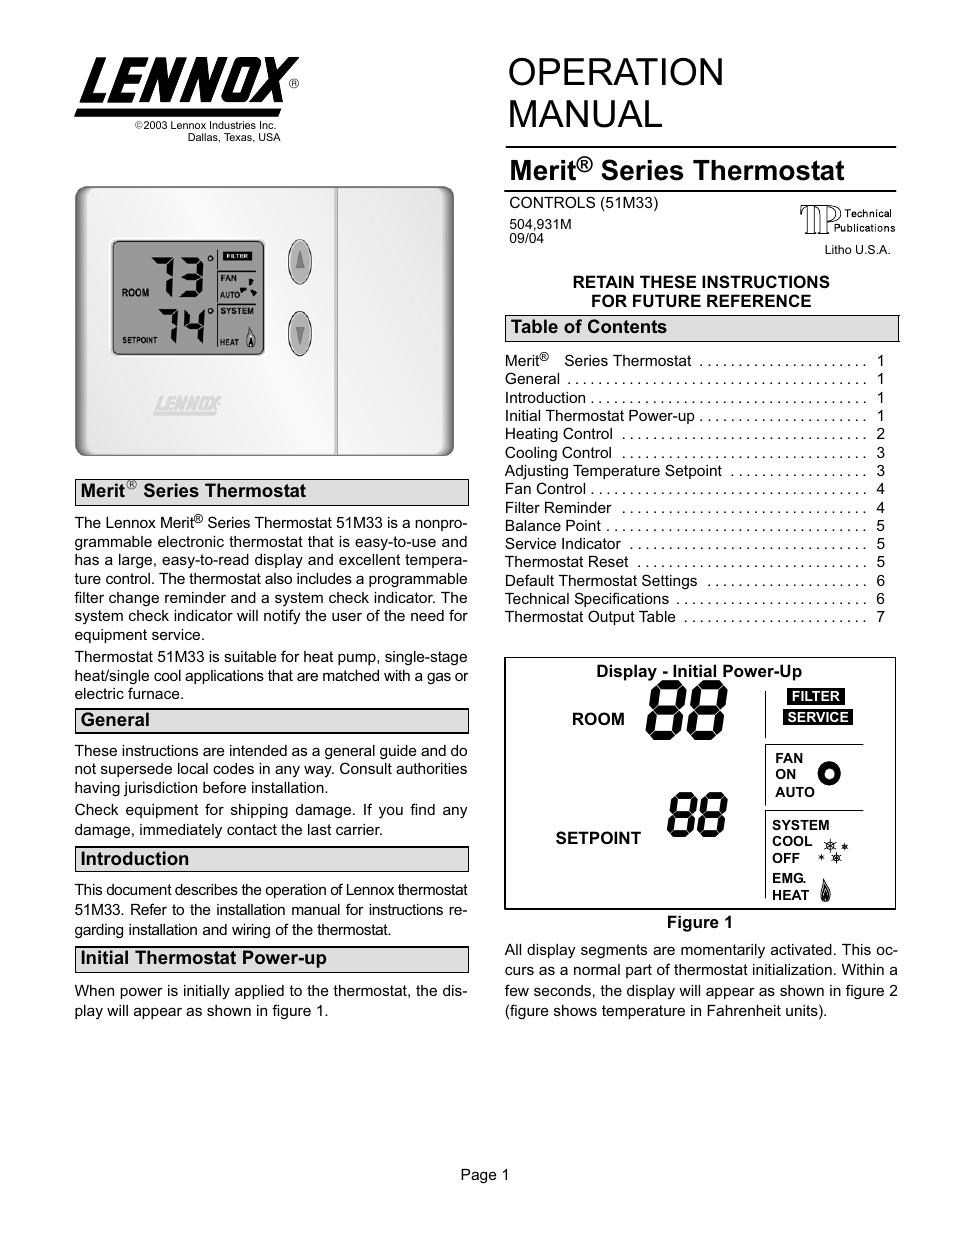 Operation manual, Merit, Series thermostat | Lennox International ...